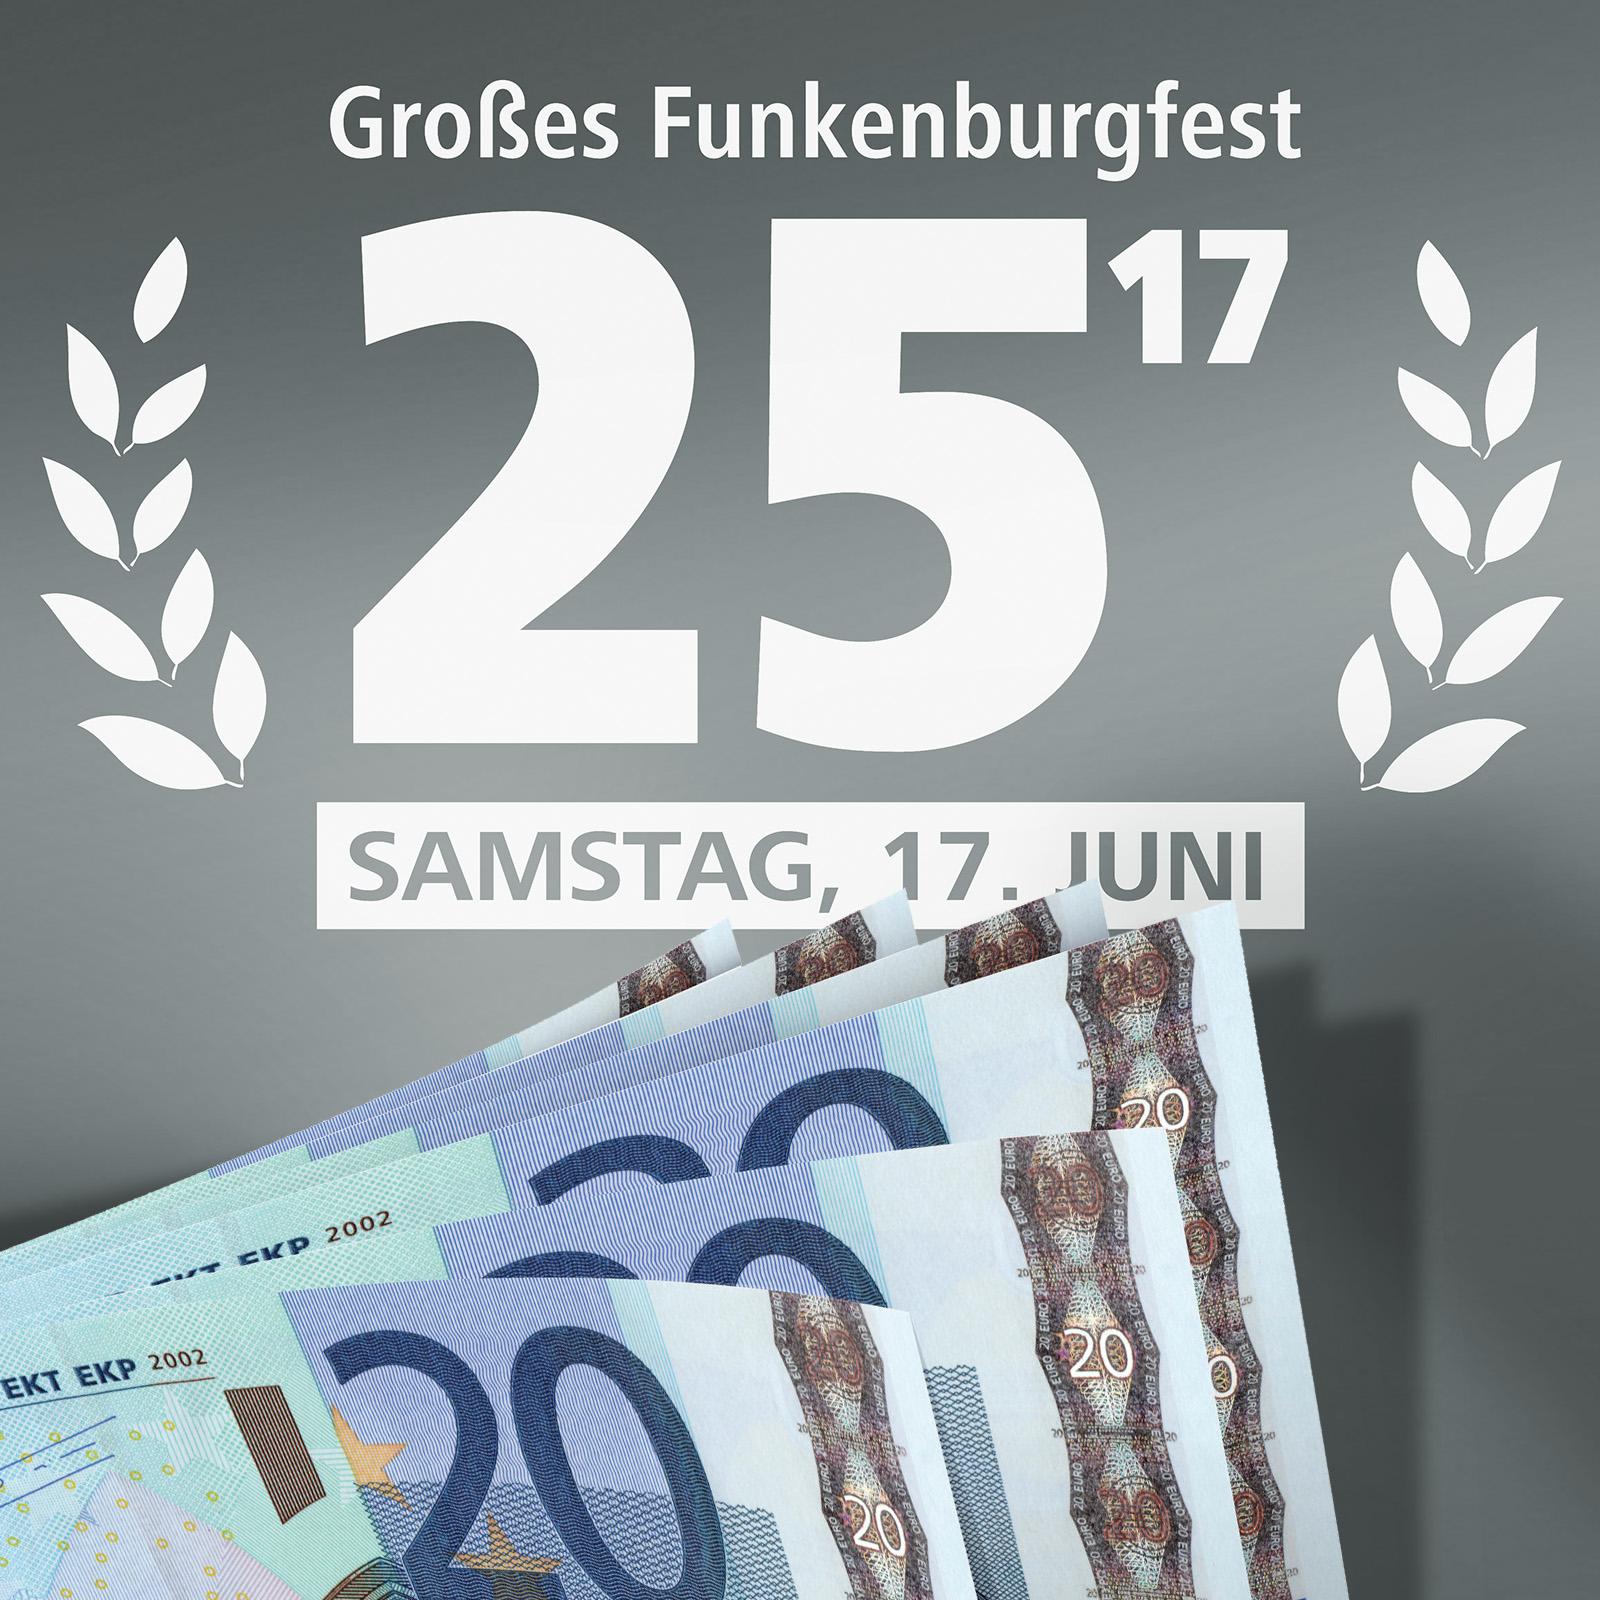 25. Großes Funkenburgfest Sponsoring